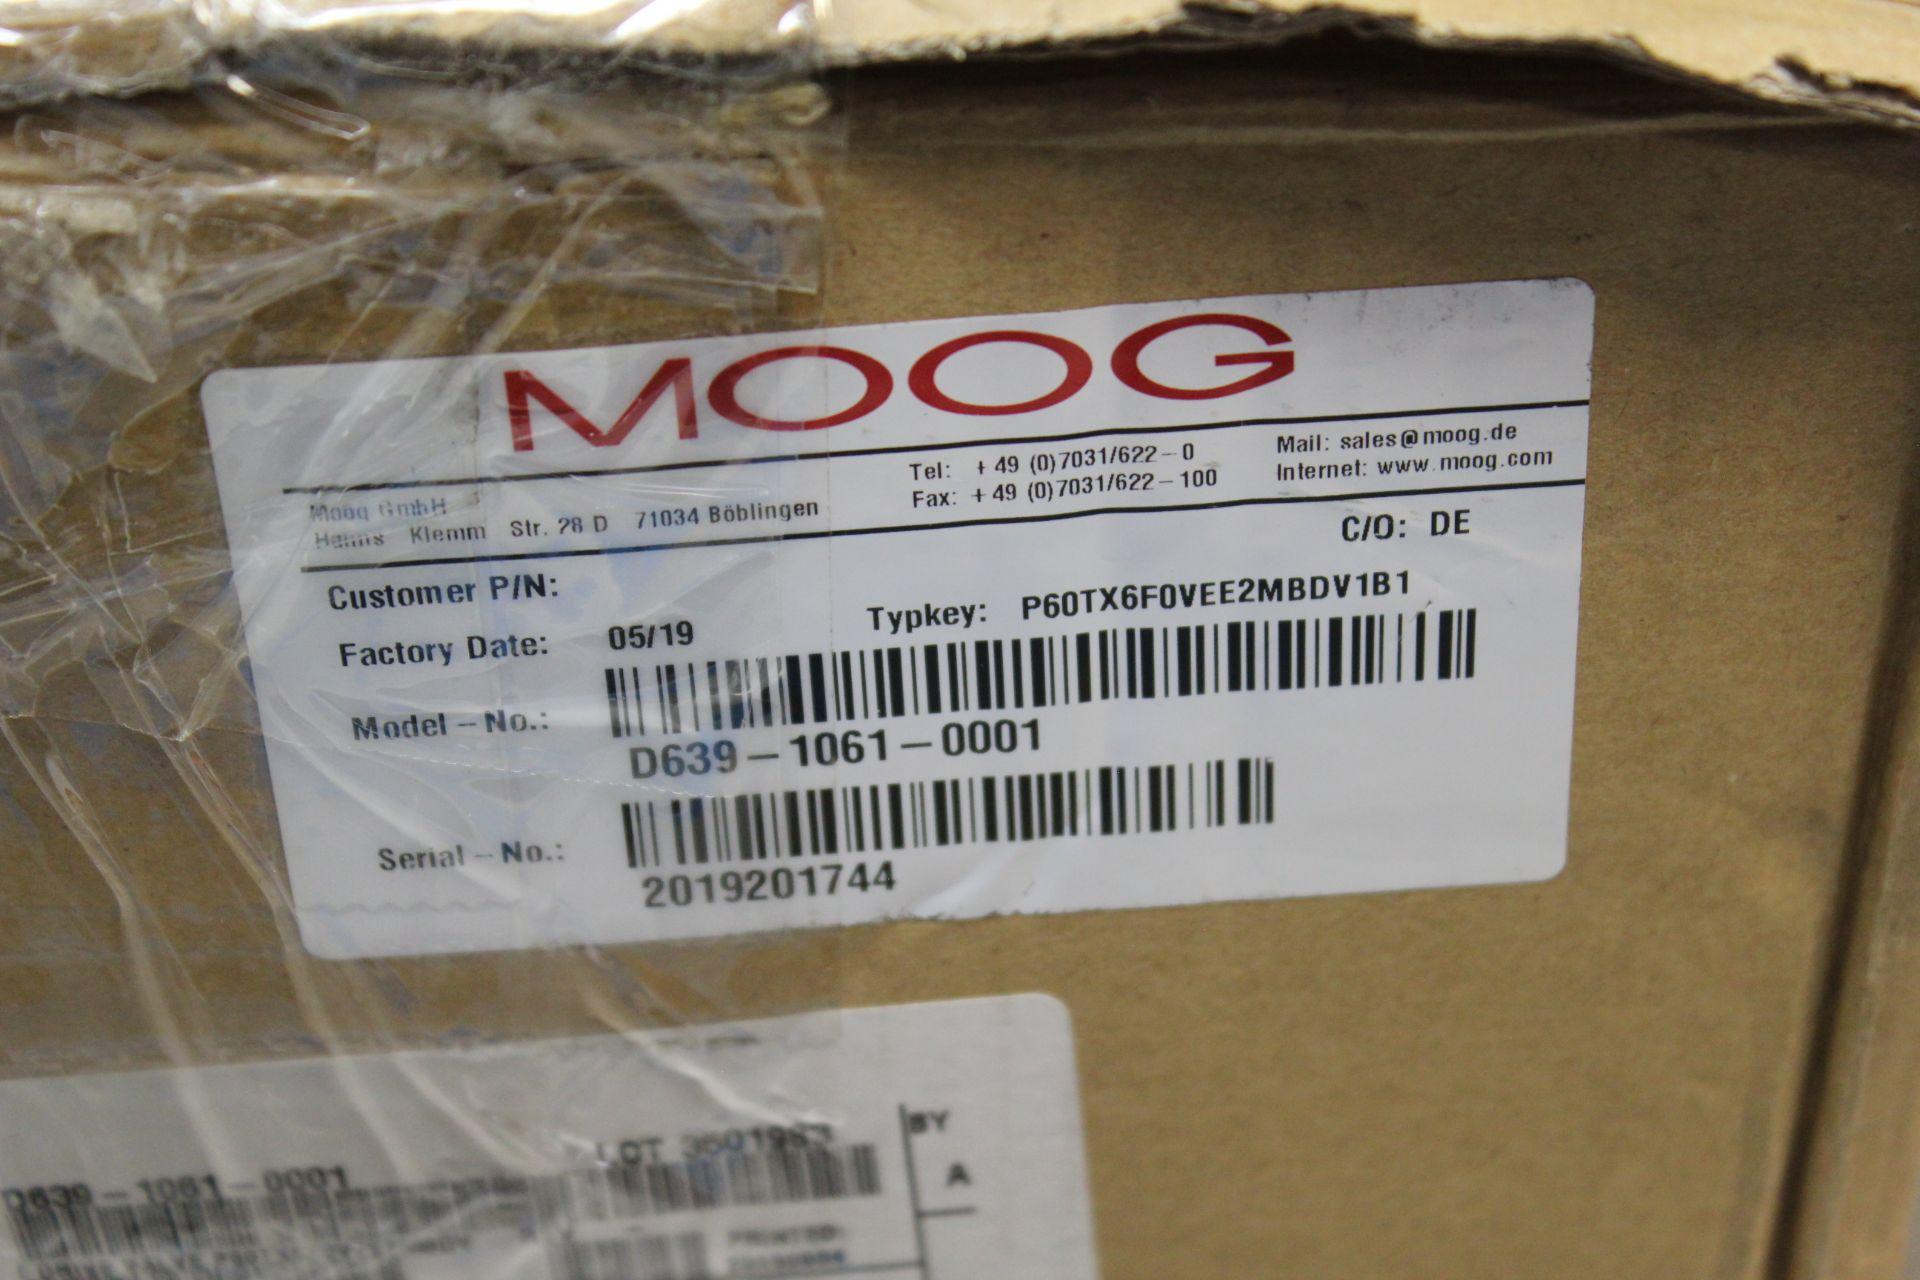 NEW MOOG DIRECT DRIVE DIGITAL CONTROL HYDRAULIC SERVO VALVE - Image 15 of 15